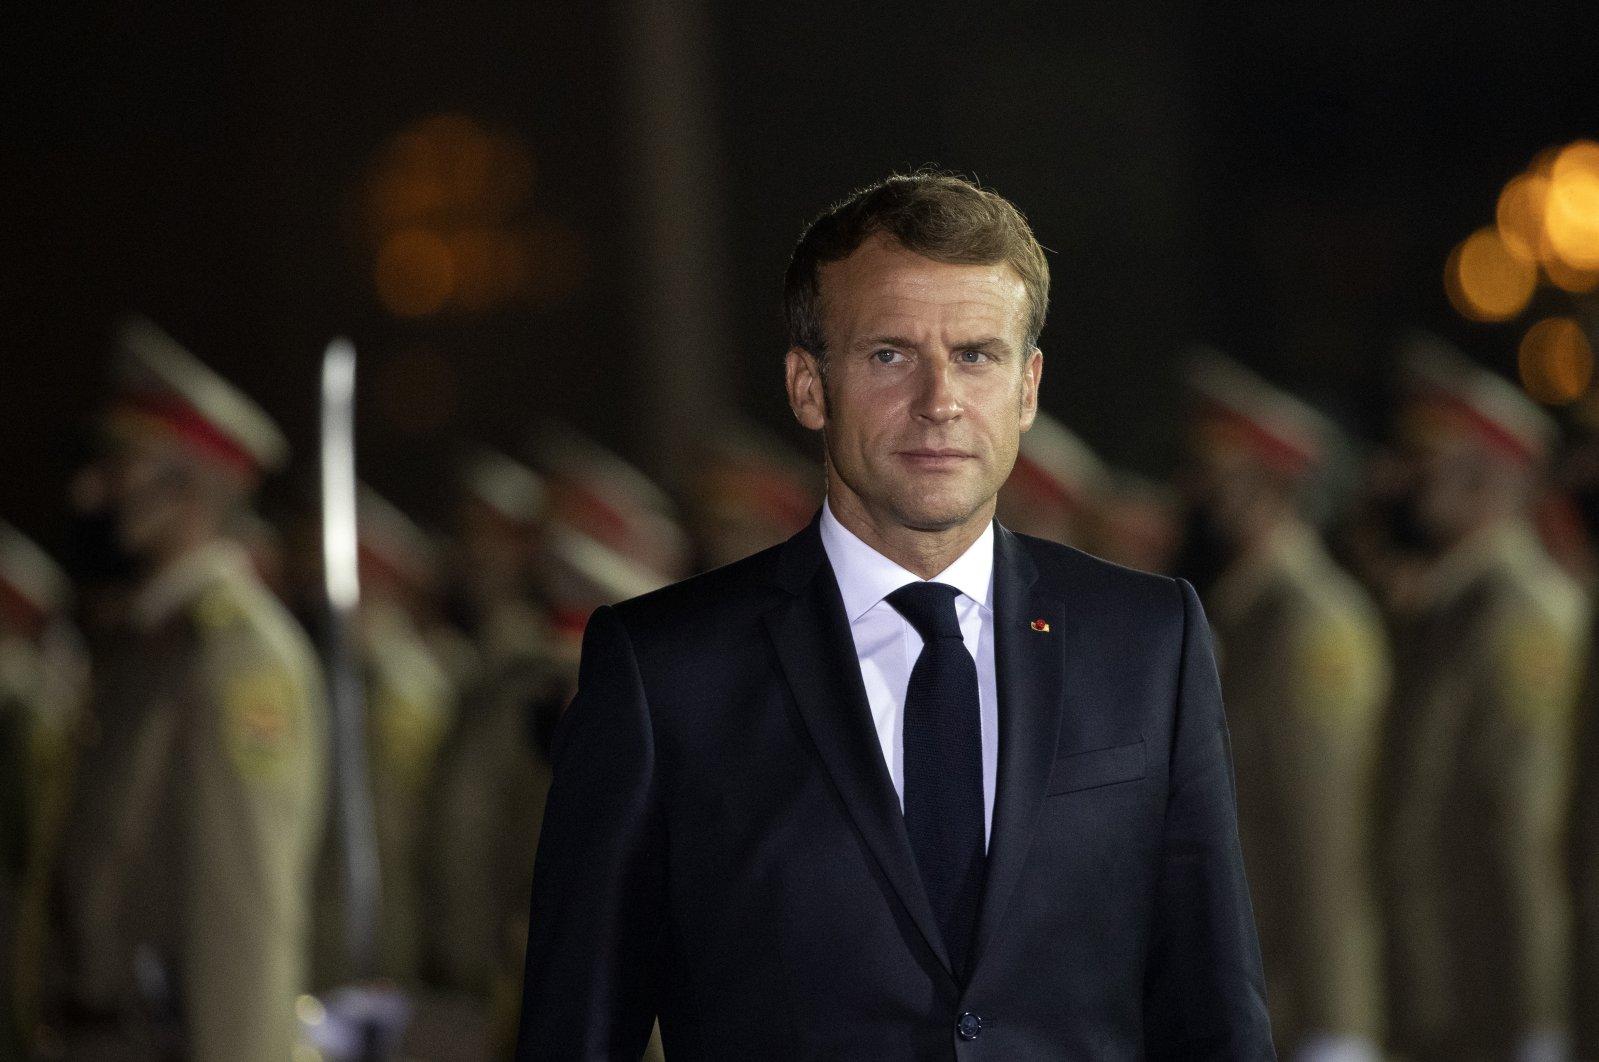 French President Emmanuel Macron arrives at Irbil international airport, Iraq, Aug. 29, 2021. (AP Photo)